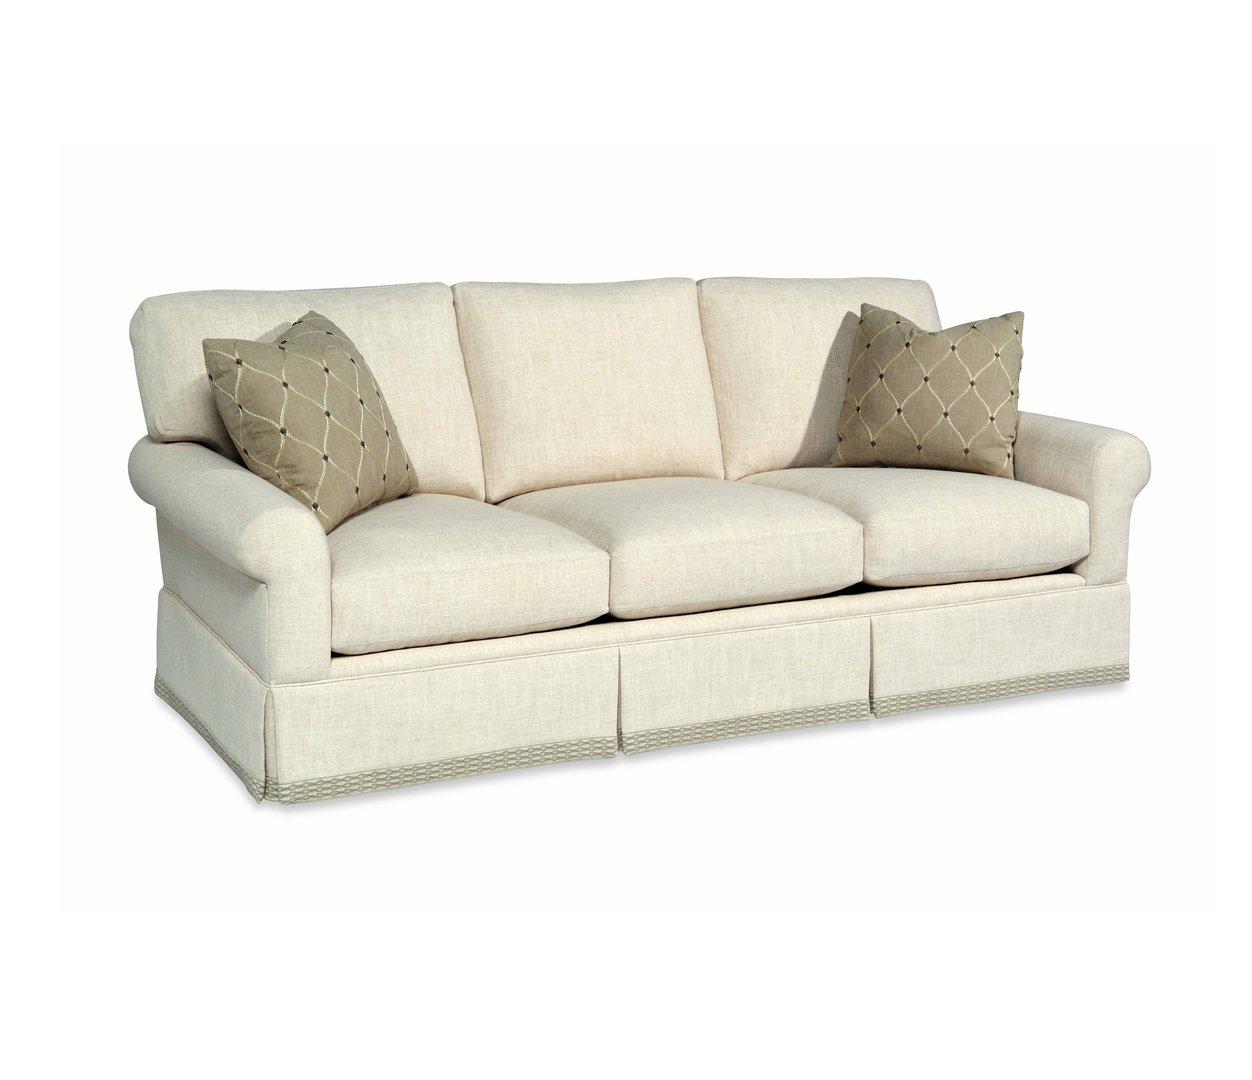 McGee Sofa Image